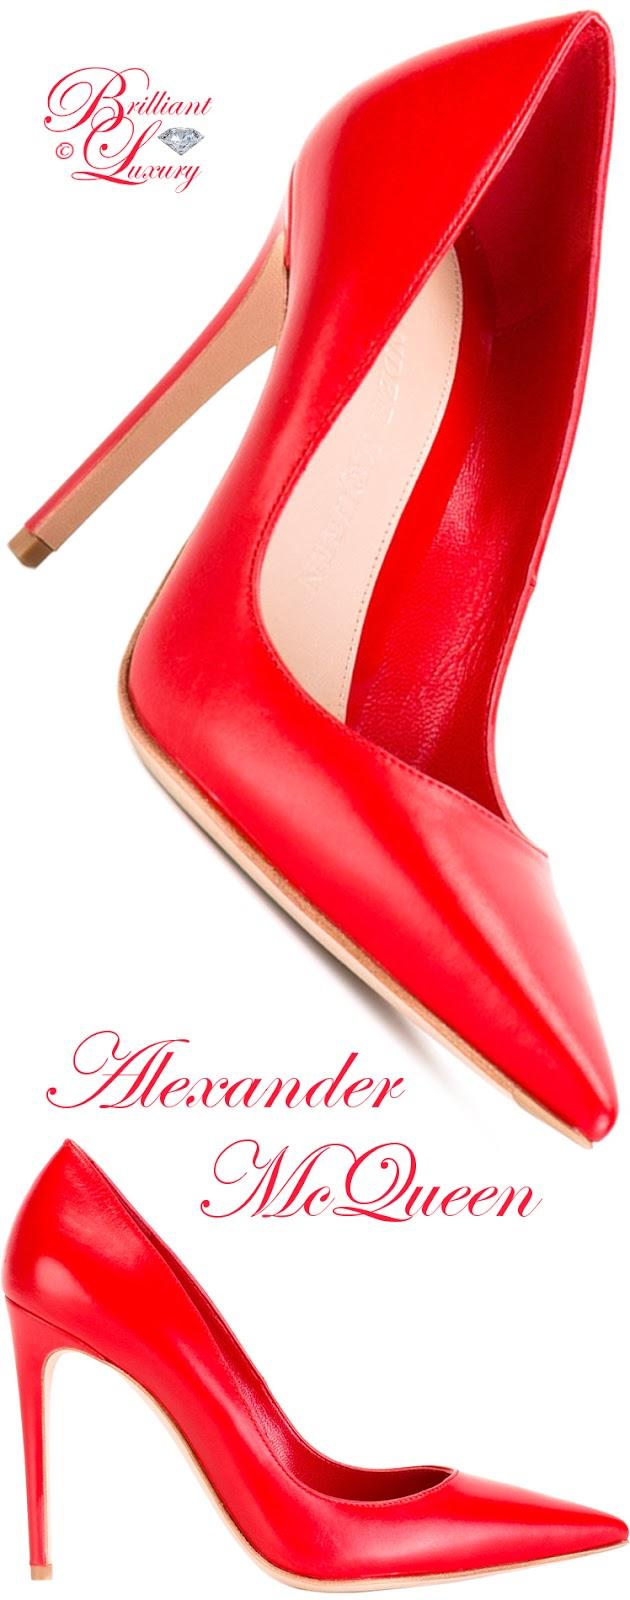 Brilliant Luxury ♦ Alexander McQueen Decolette Pumps